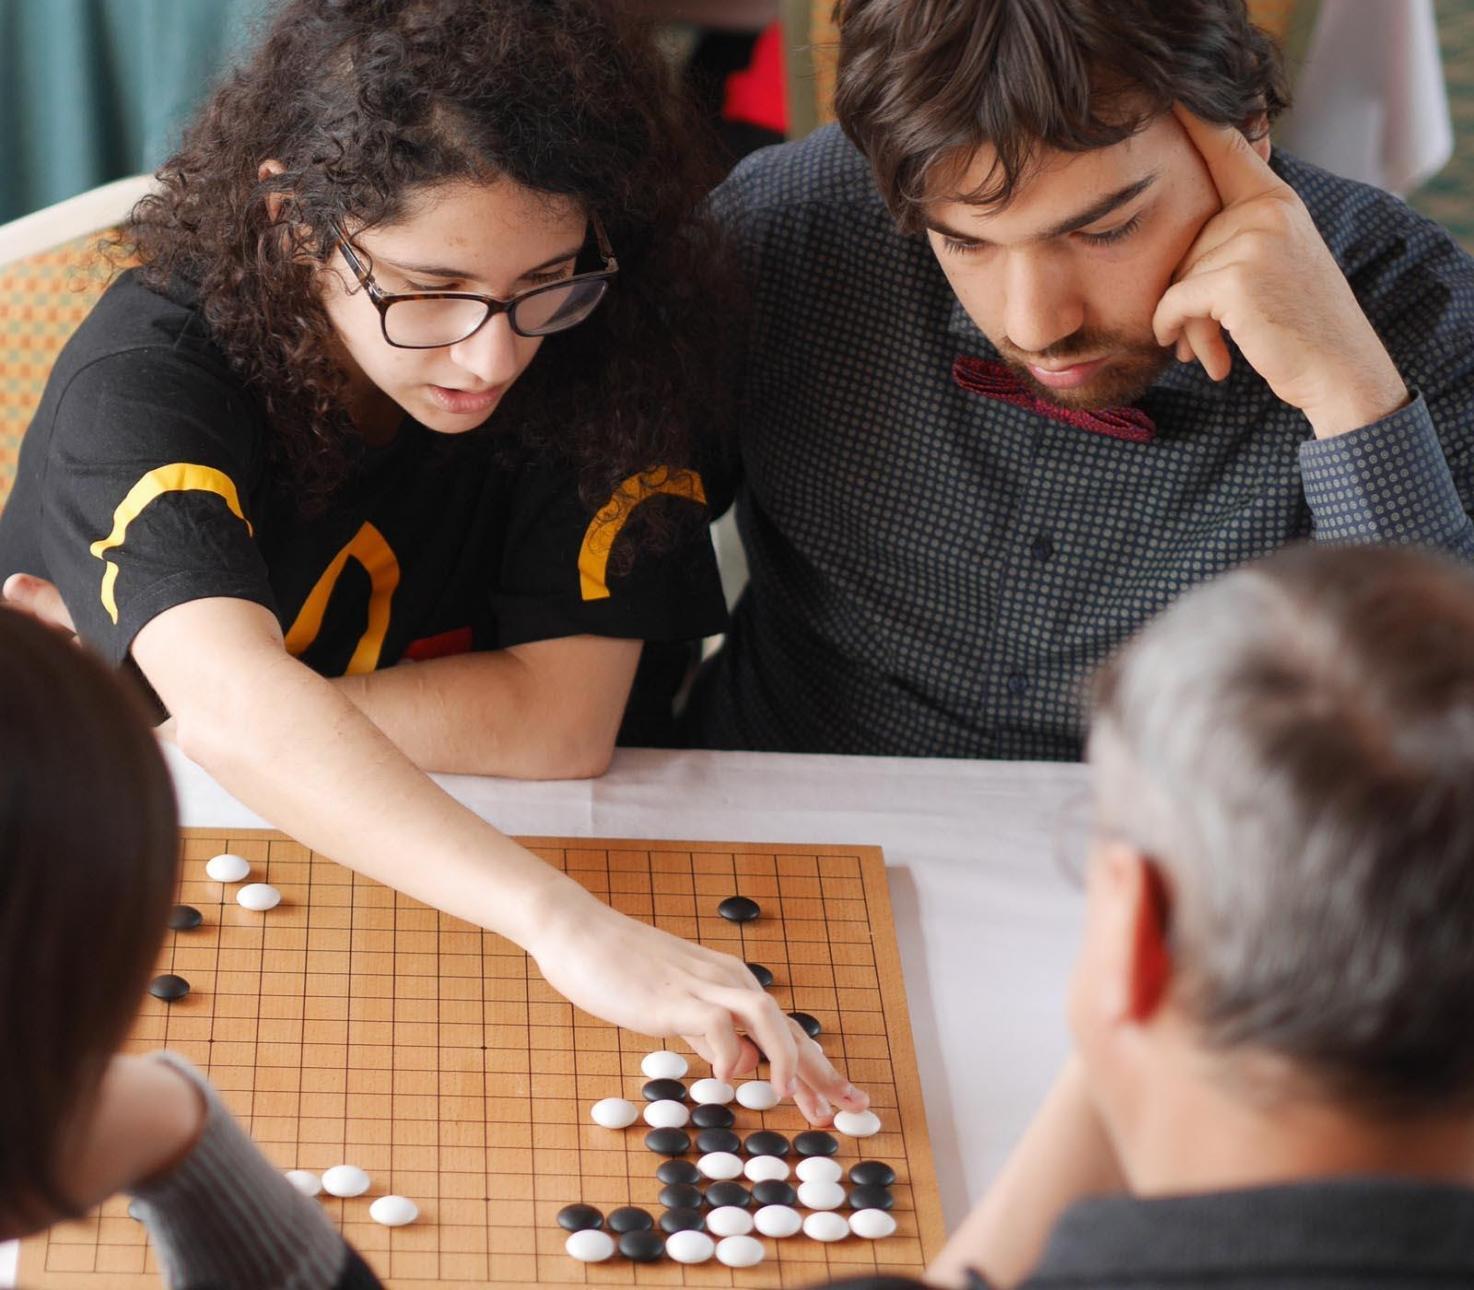 Pair Go - Team Variant of Go Game